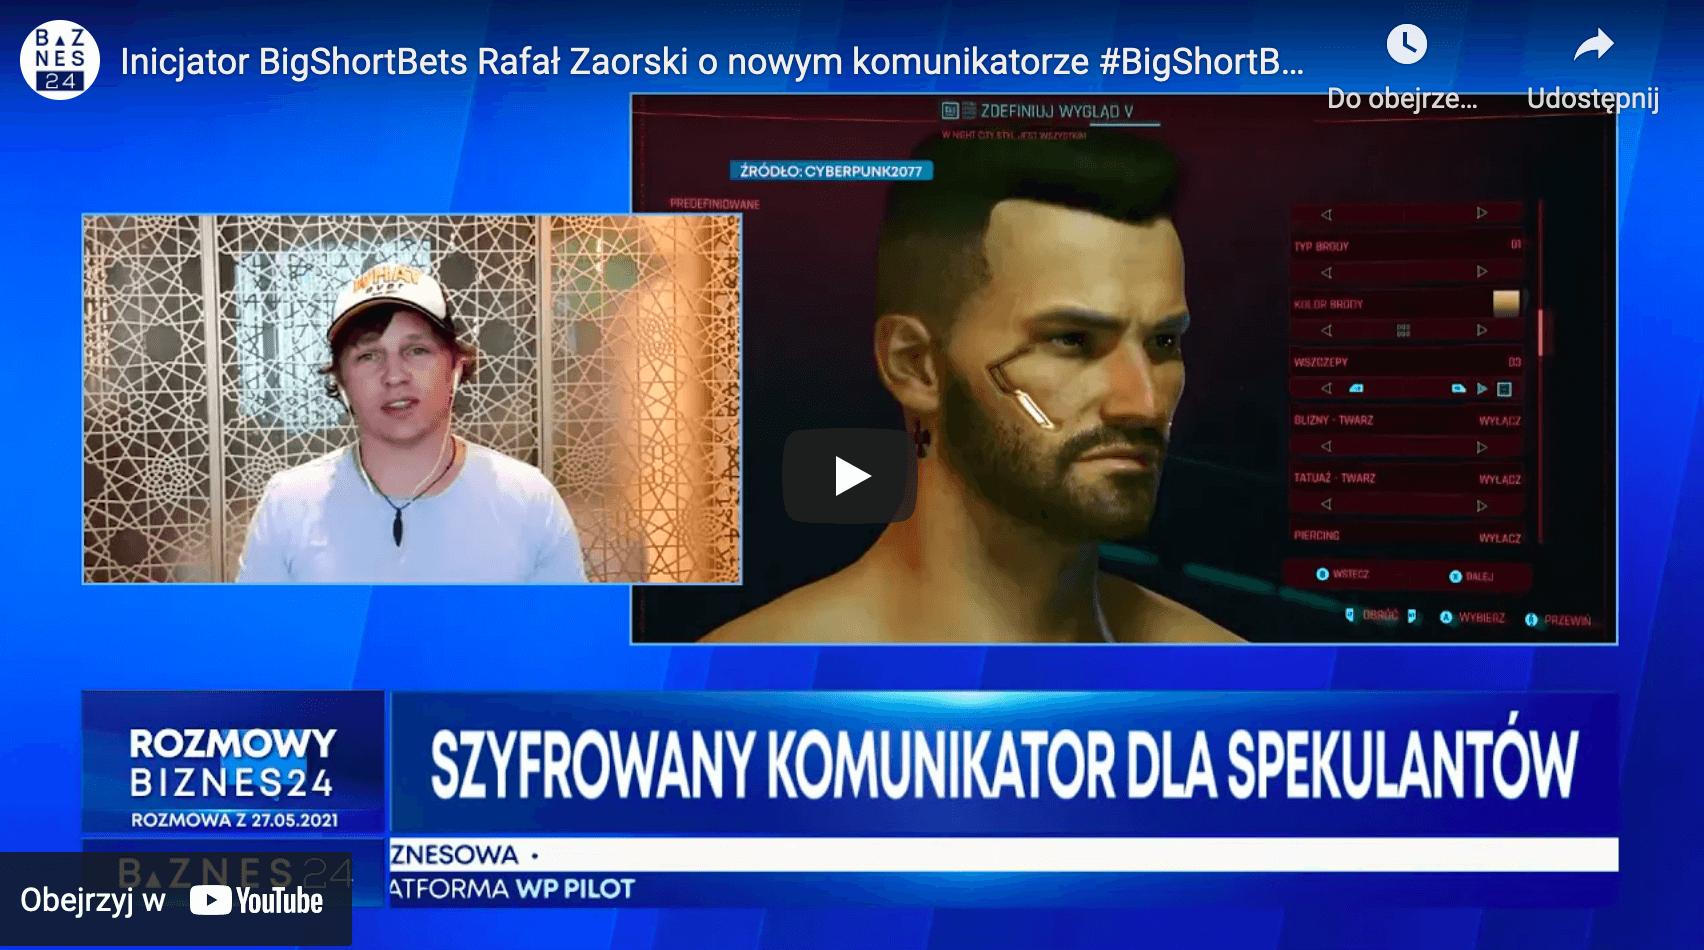 Biznes24 BigShortBets Rafał Zaorski